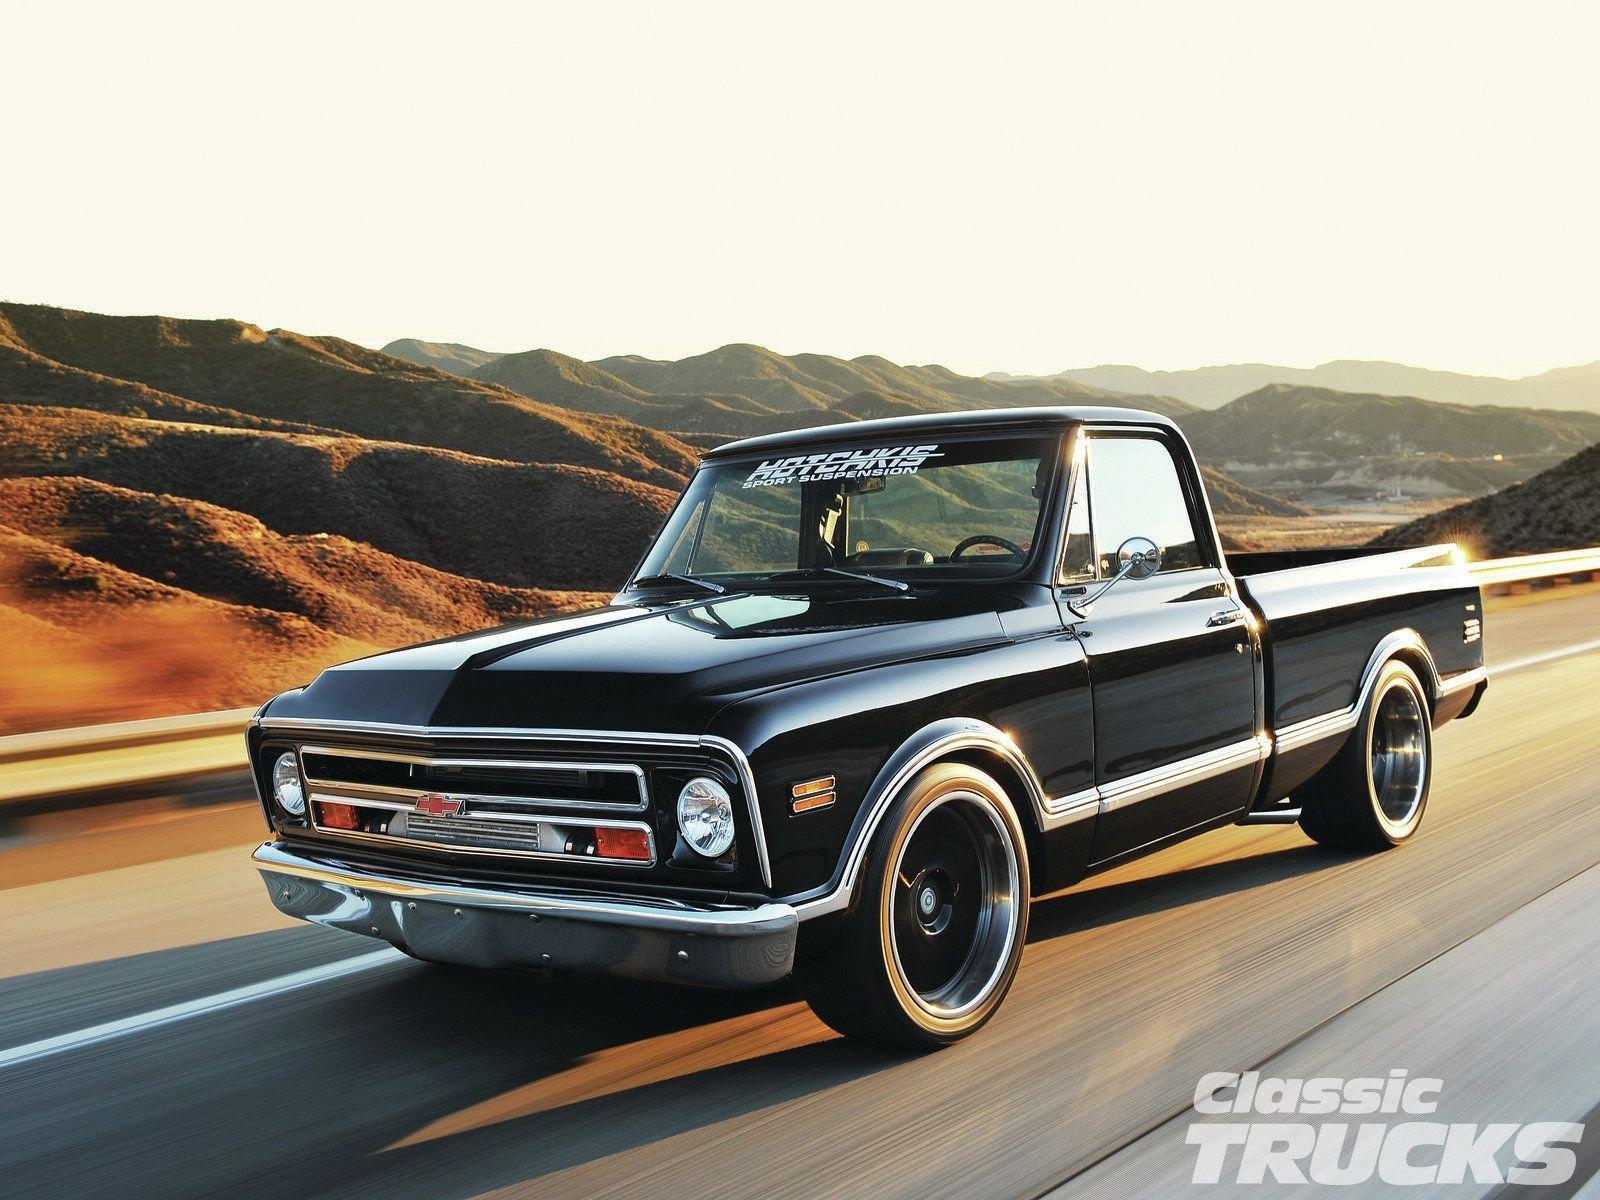 Apache Cameo F100 F150 3100 Pickup Retro Classic Custom Truck Usa 1970 Ford Stepside Chevrolet Cheyenne Wallpaper 1600x1200 518026 Wallpaperup